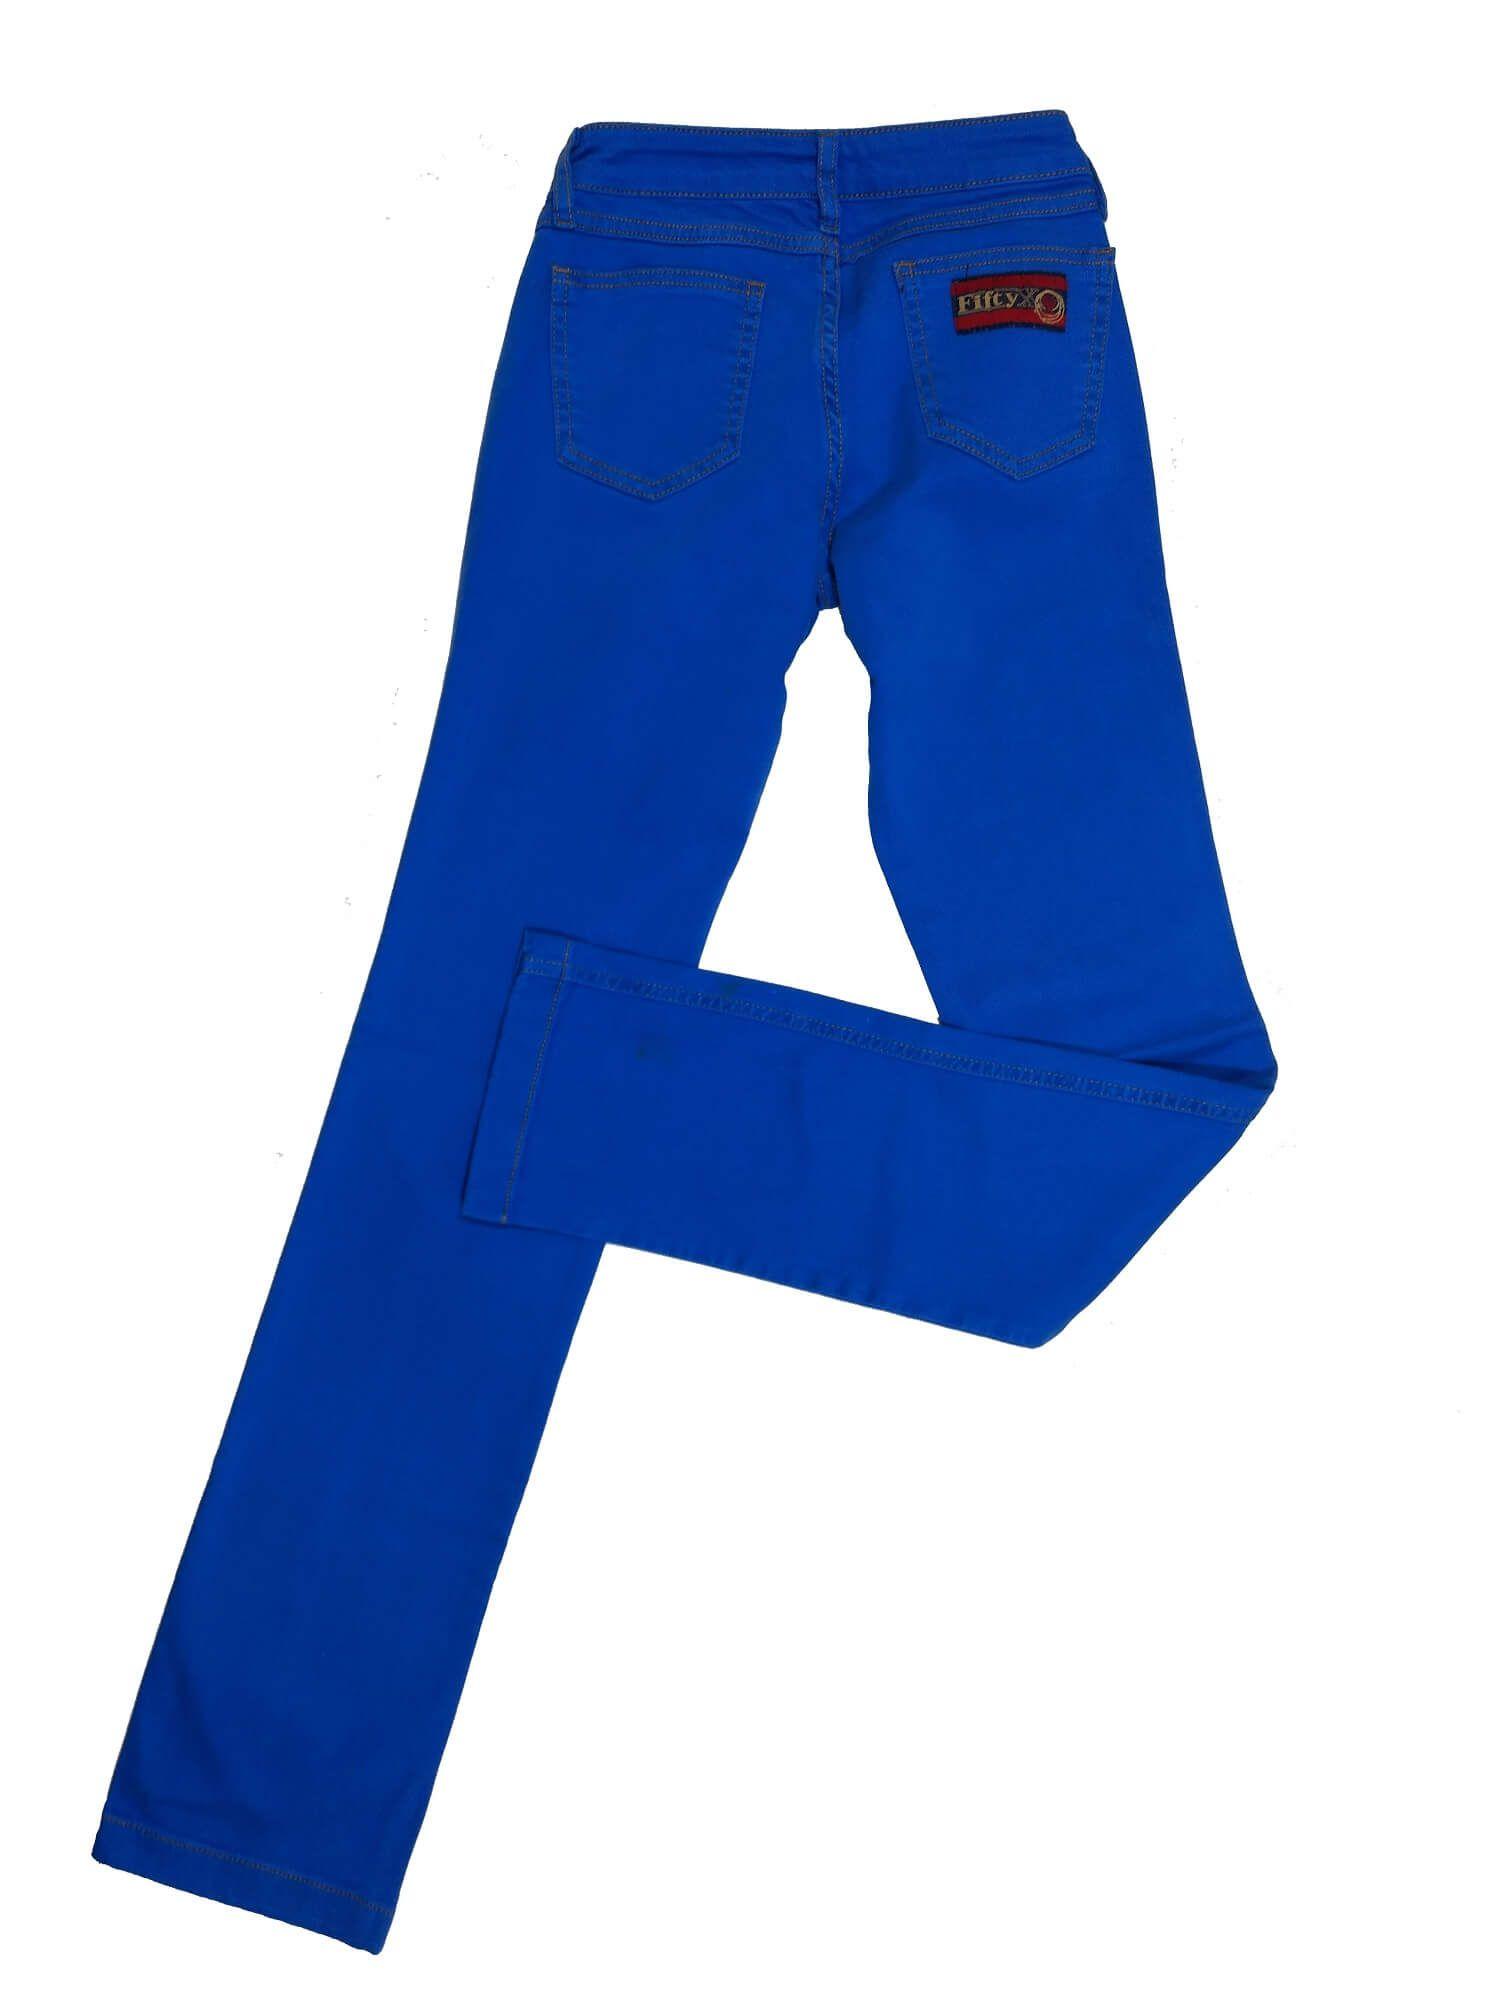 Calça Feminina 50X Azul Bic Ref. 5561